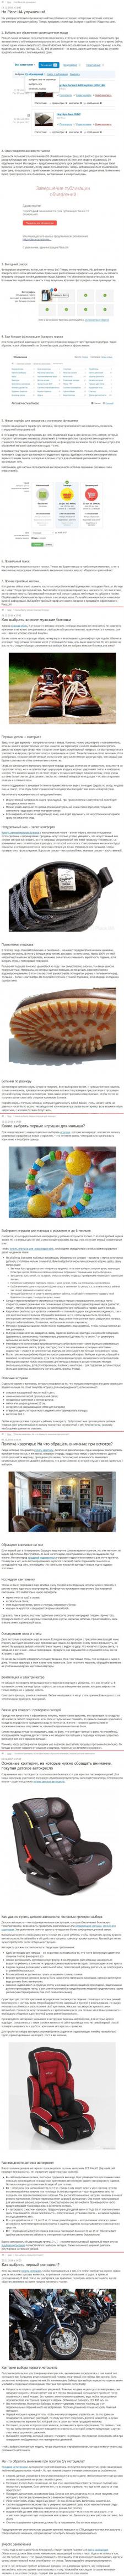 ТОРГОВЛЯ | Доска объявлений place.ua